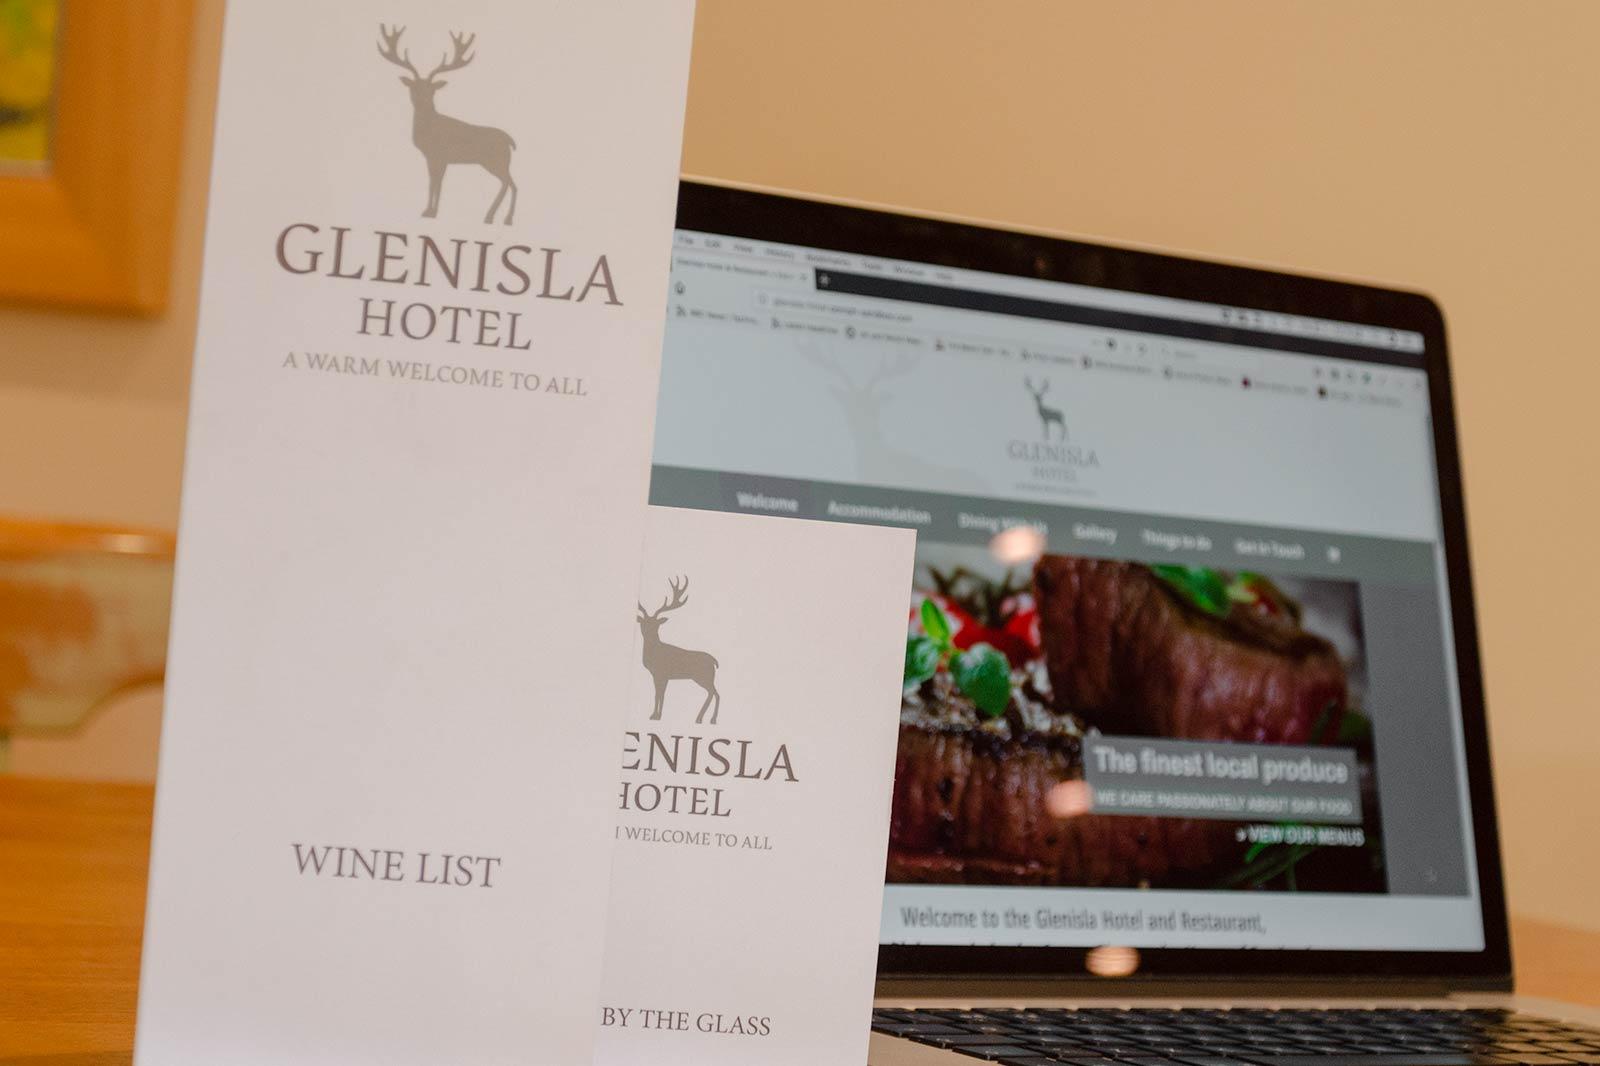 Glenisla Hotel Website